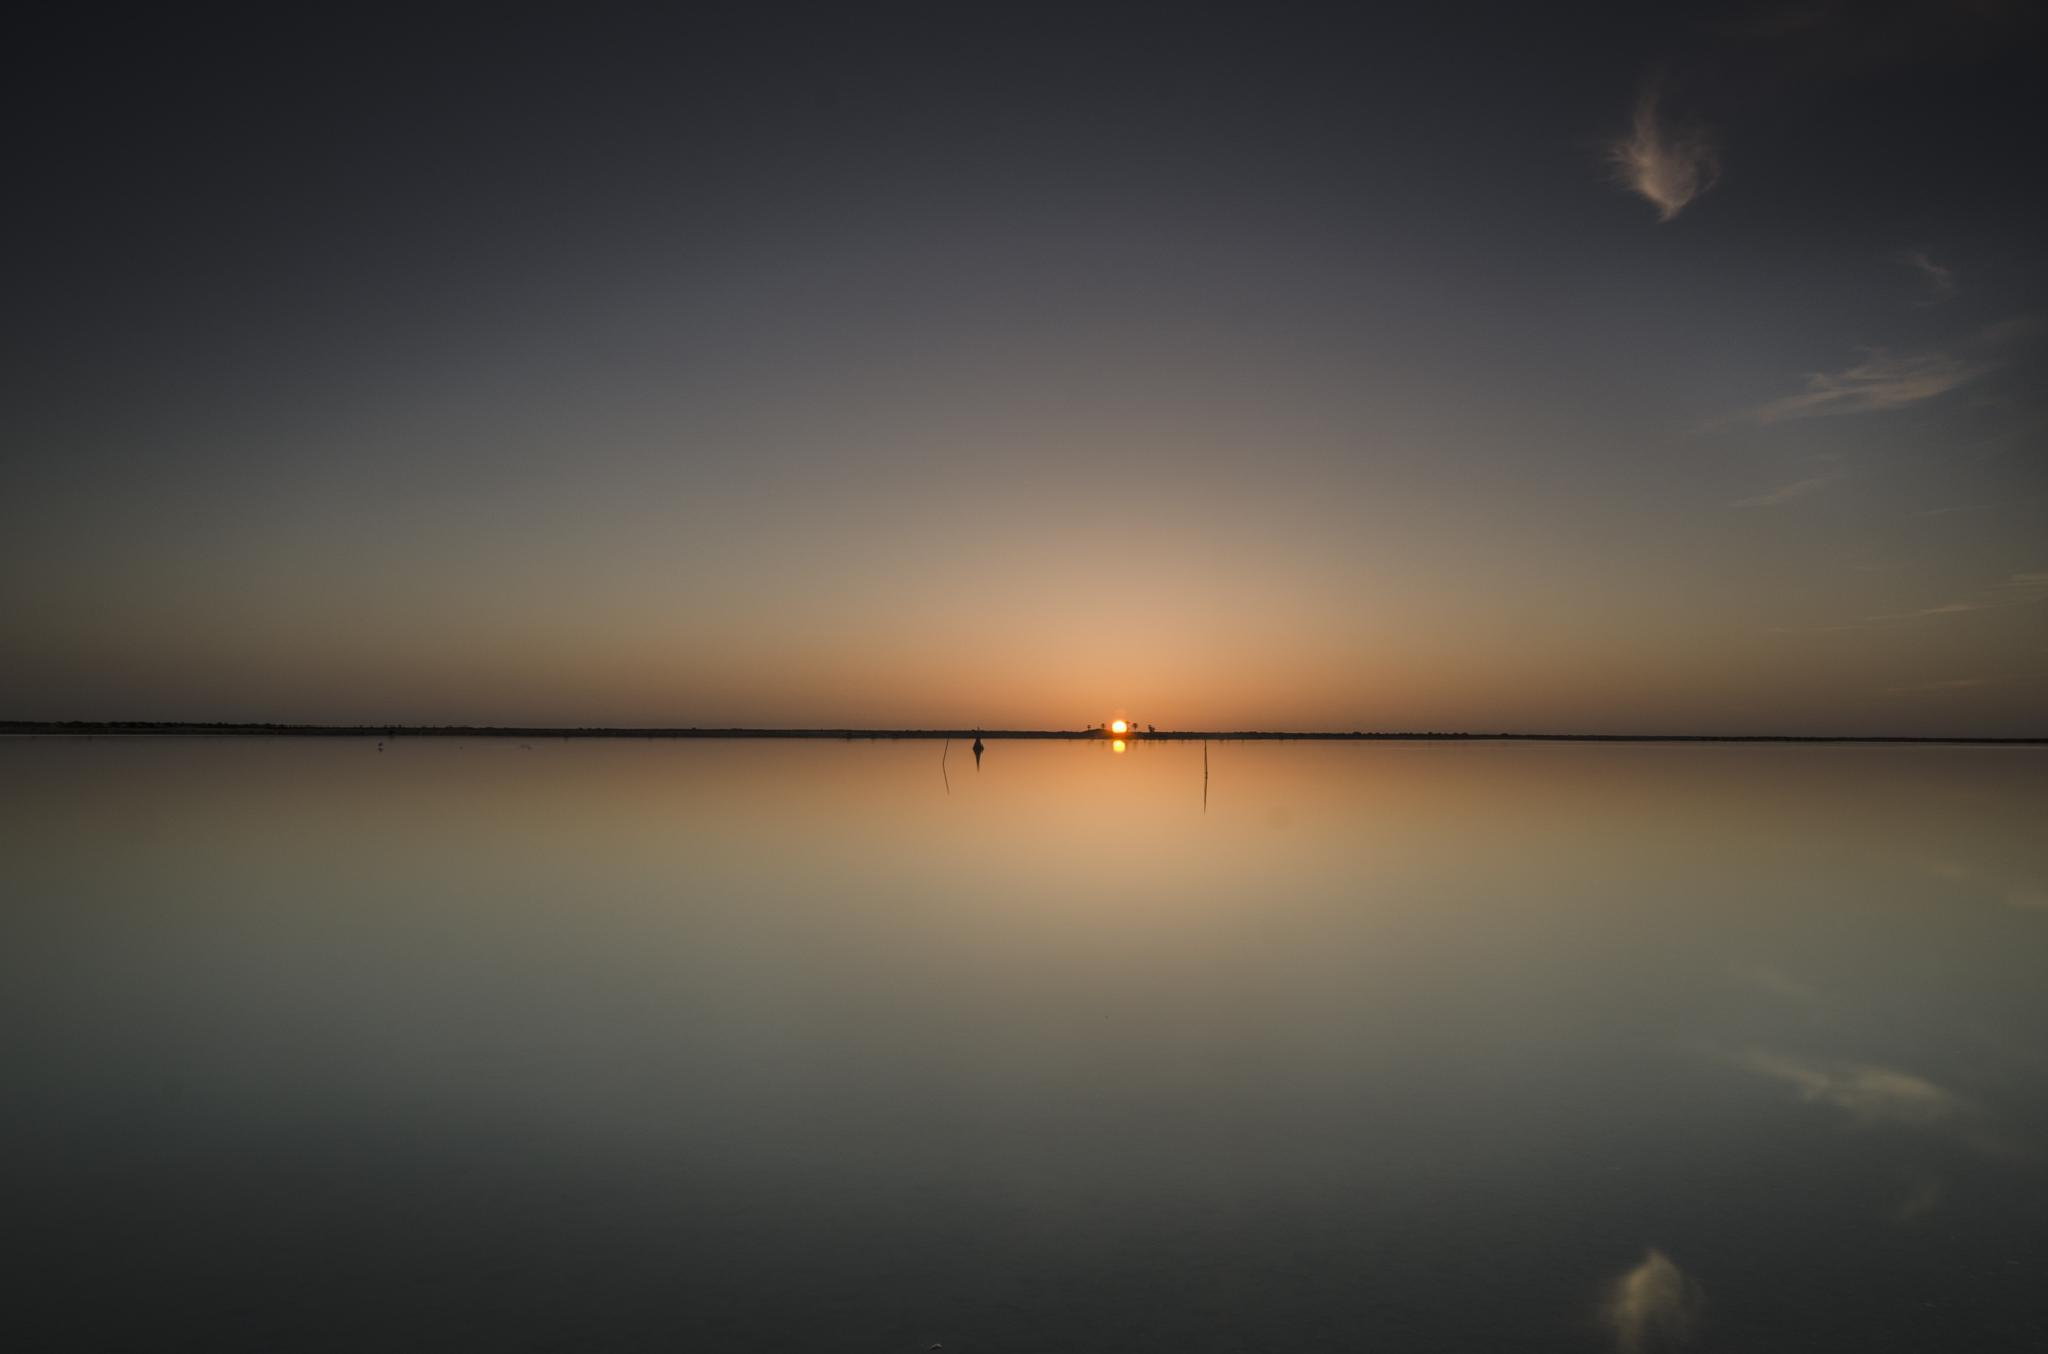 la laguna  by Jose Soto Munuera